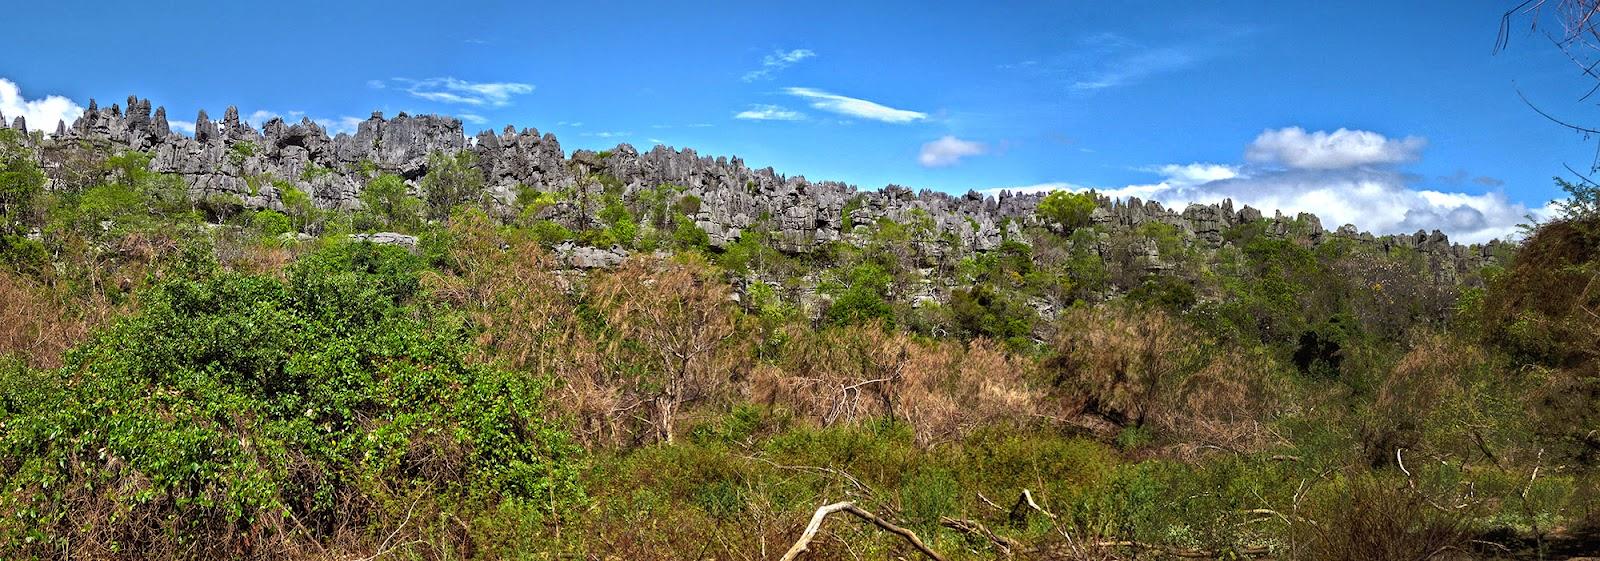 Madagascar8 - 096.jpg